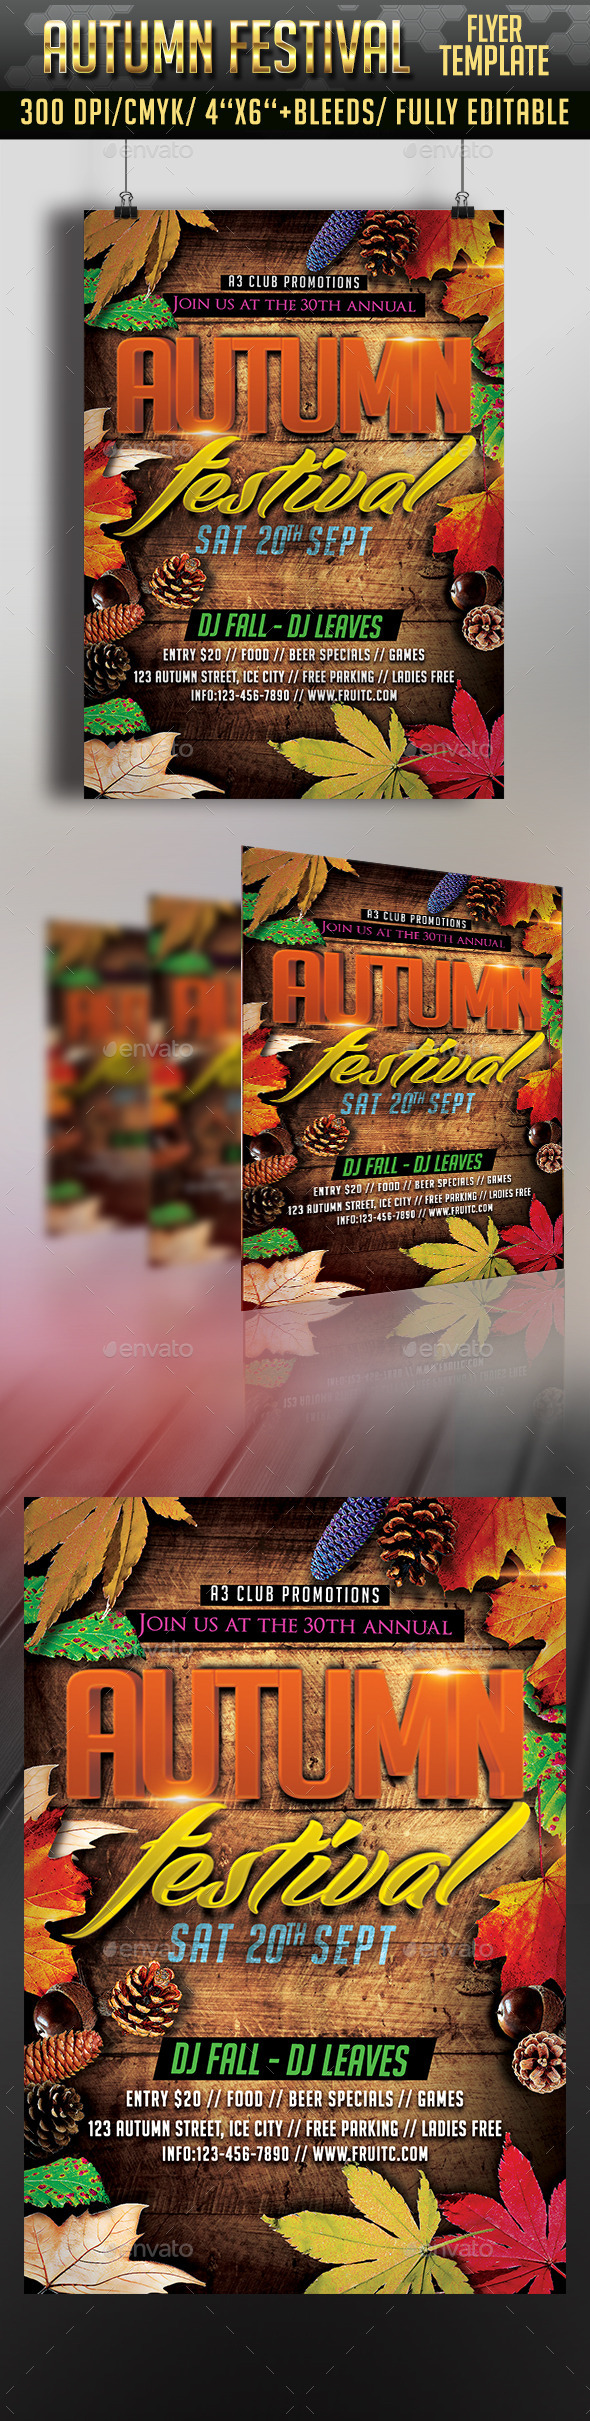 Autumn Festival Flyer Template #design Download: http://graphicriver.net/item/autumn-festival-flyer-/12607095?ref=ksioks